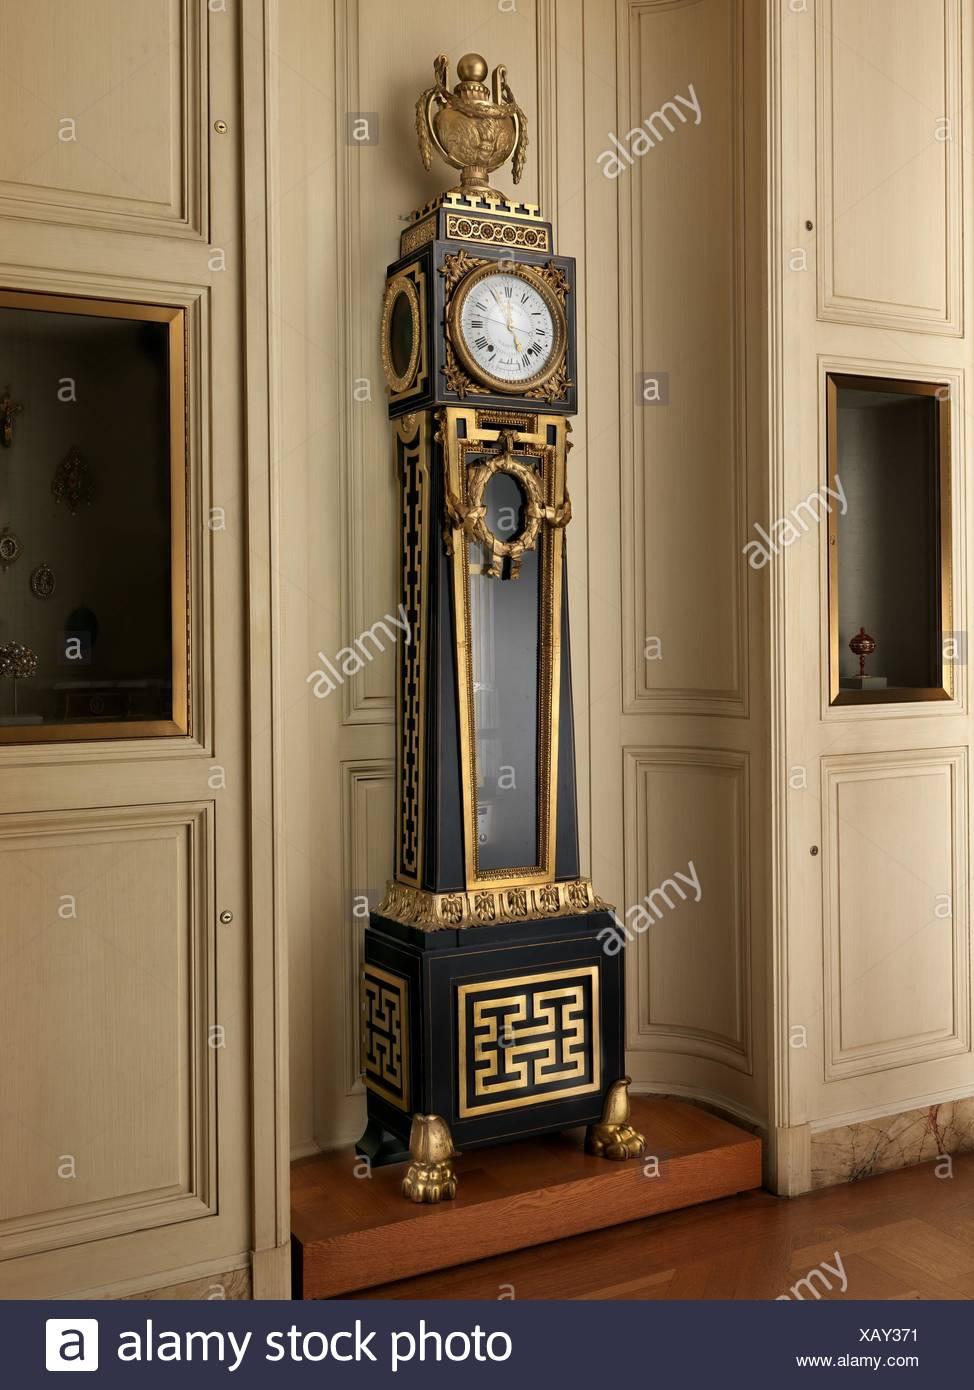 Longcase astronomical regulator. Maker: Clockmaker: Ferdinand Berthoud (French, 1727-1807); Maker: Case maker: Balthazar Lieutaud (French, ca. - Stock Image